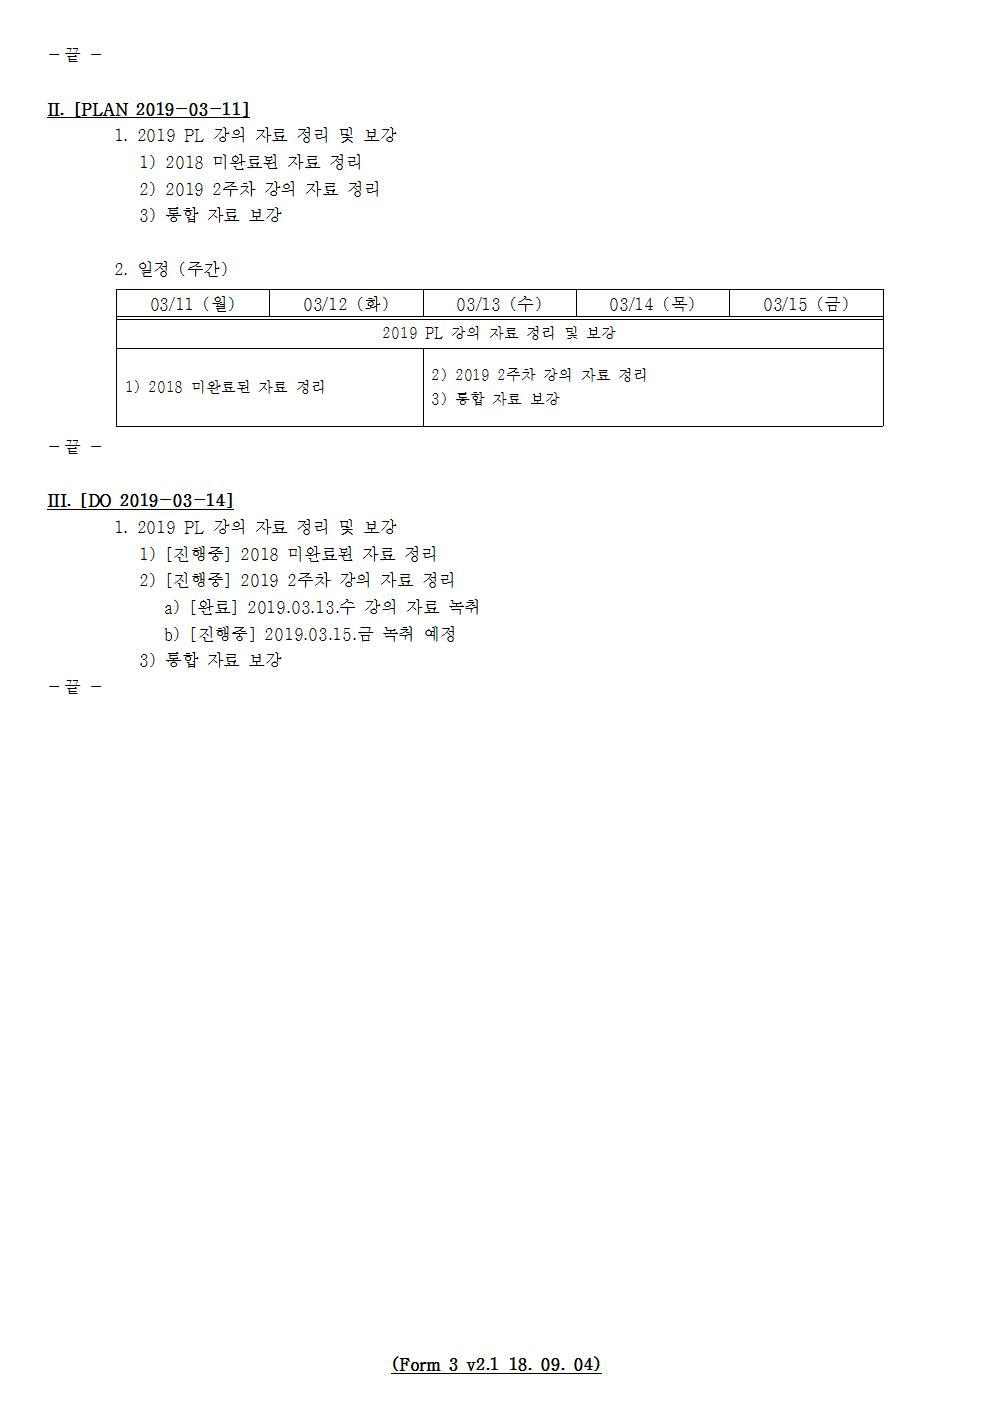 D-[19-014-PP-06]-[Book-PL]-[2019-03-14][JS]002.jpg